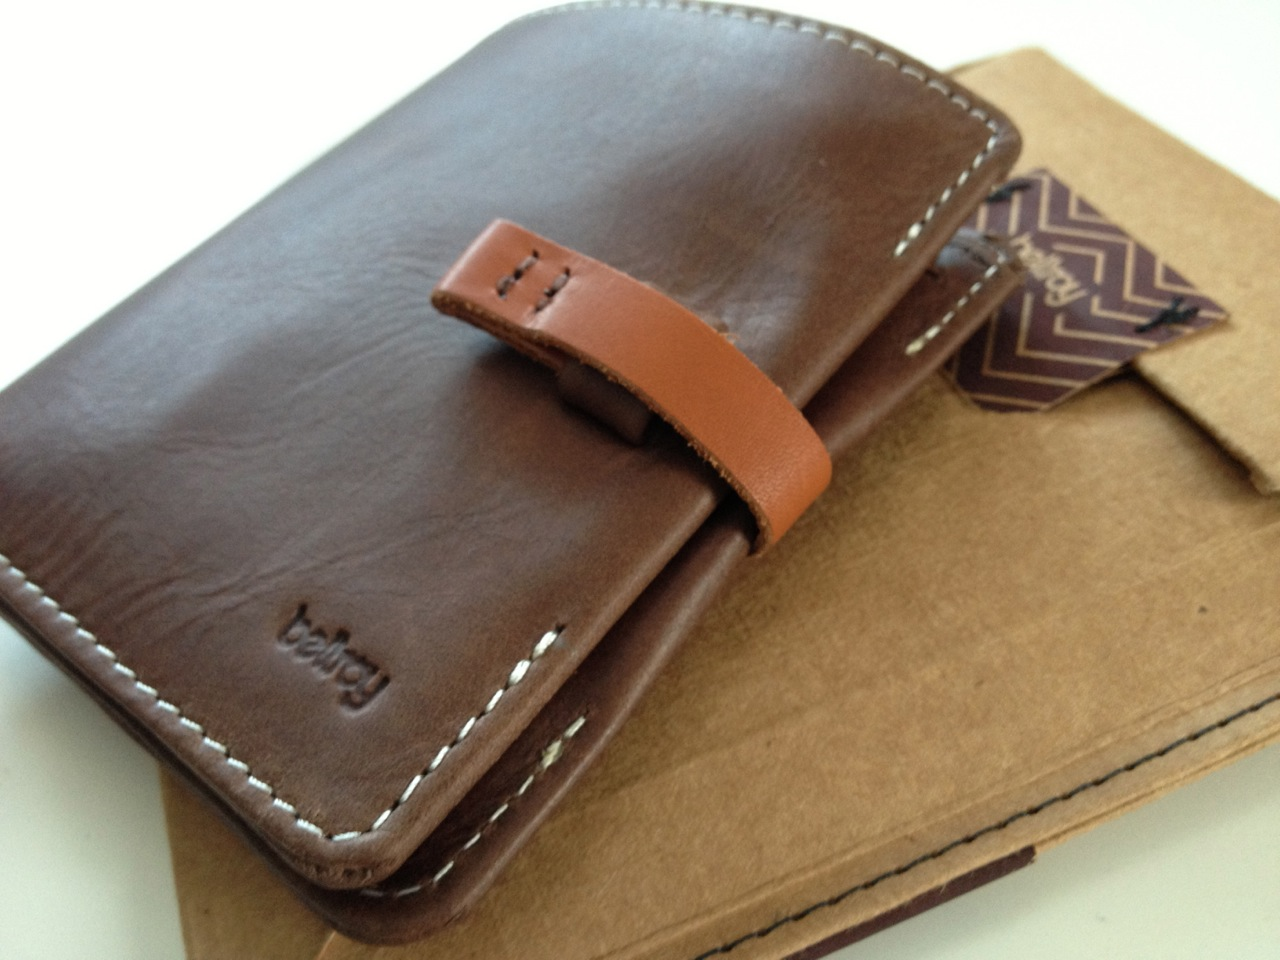 Bellroy Pocket Book Wallet